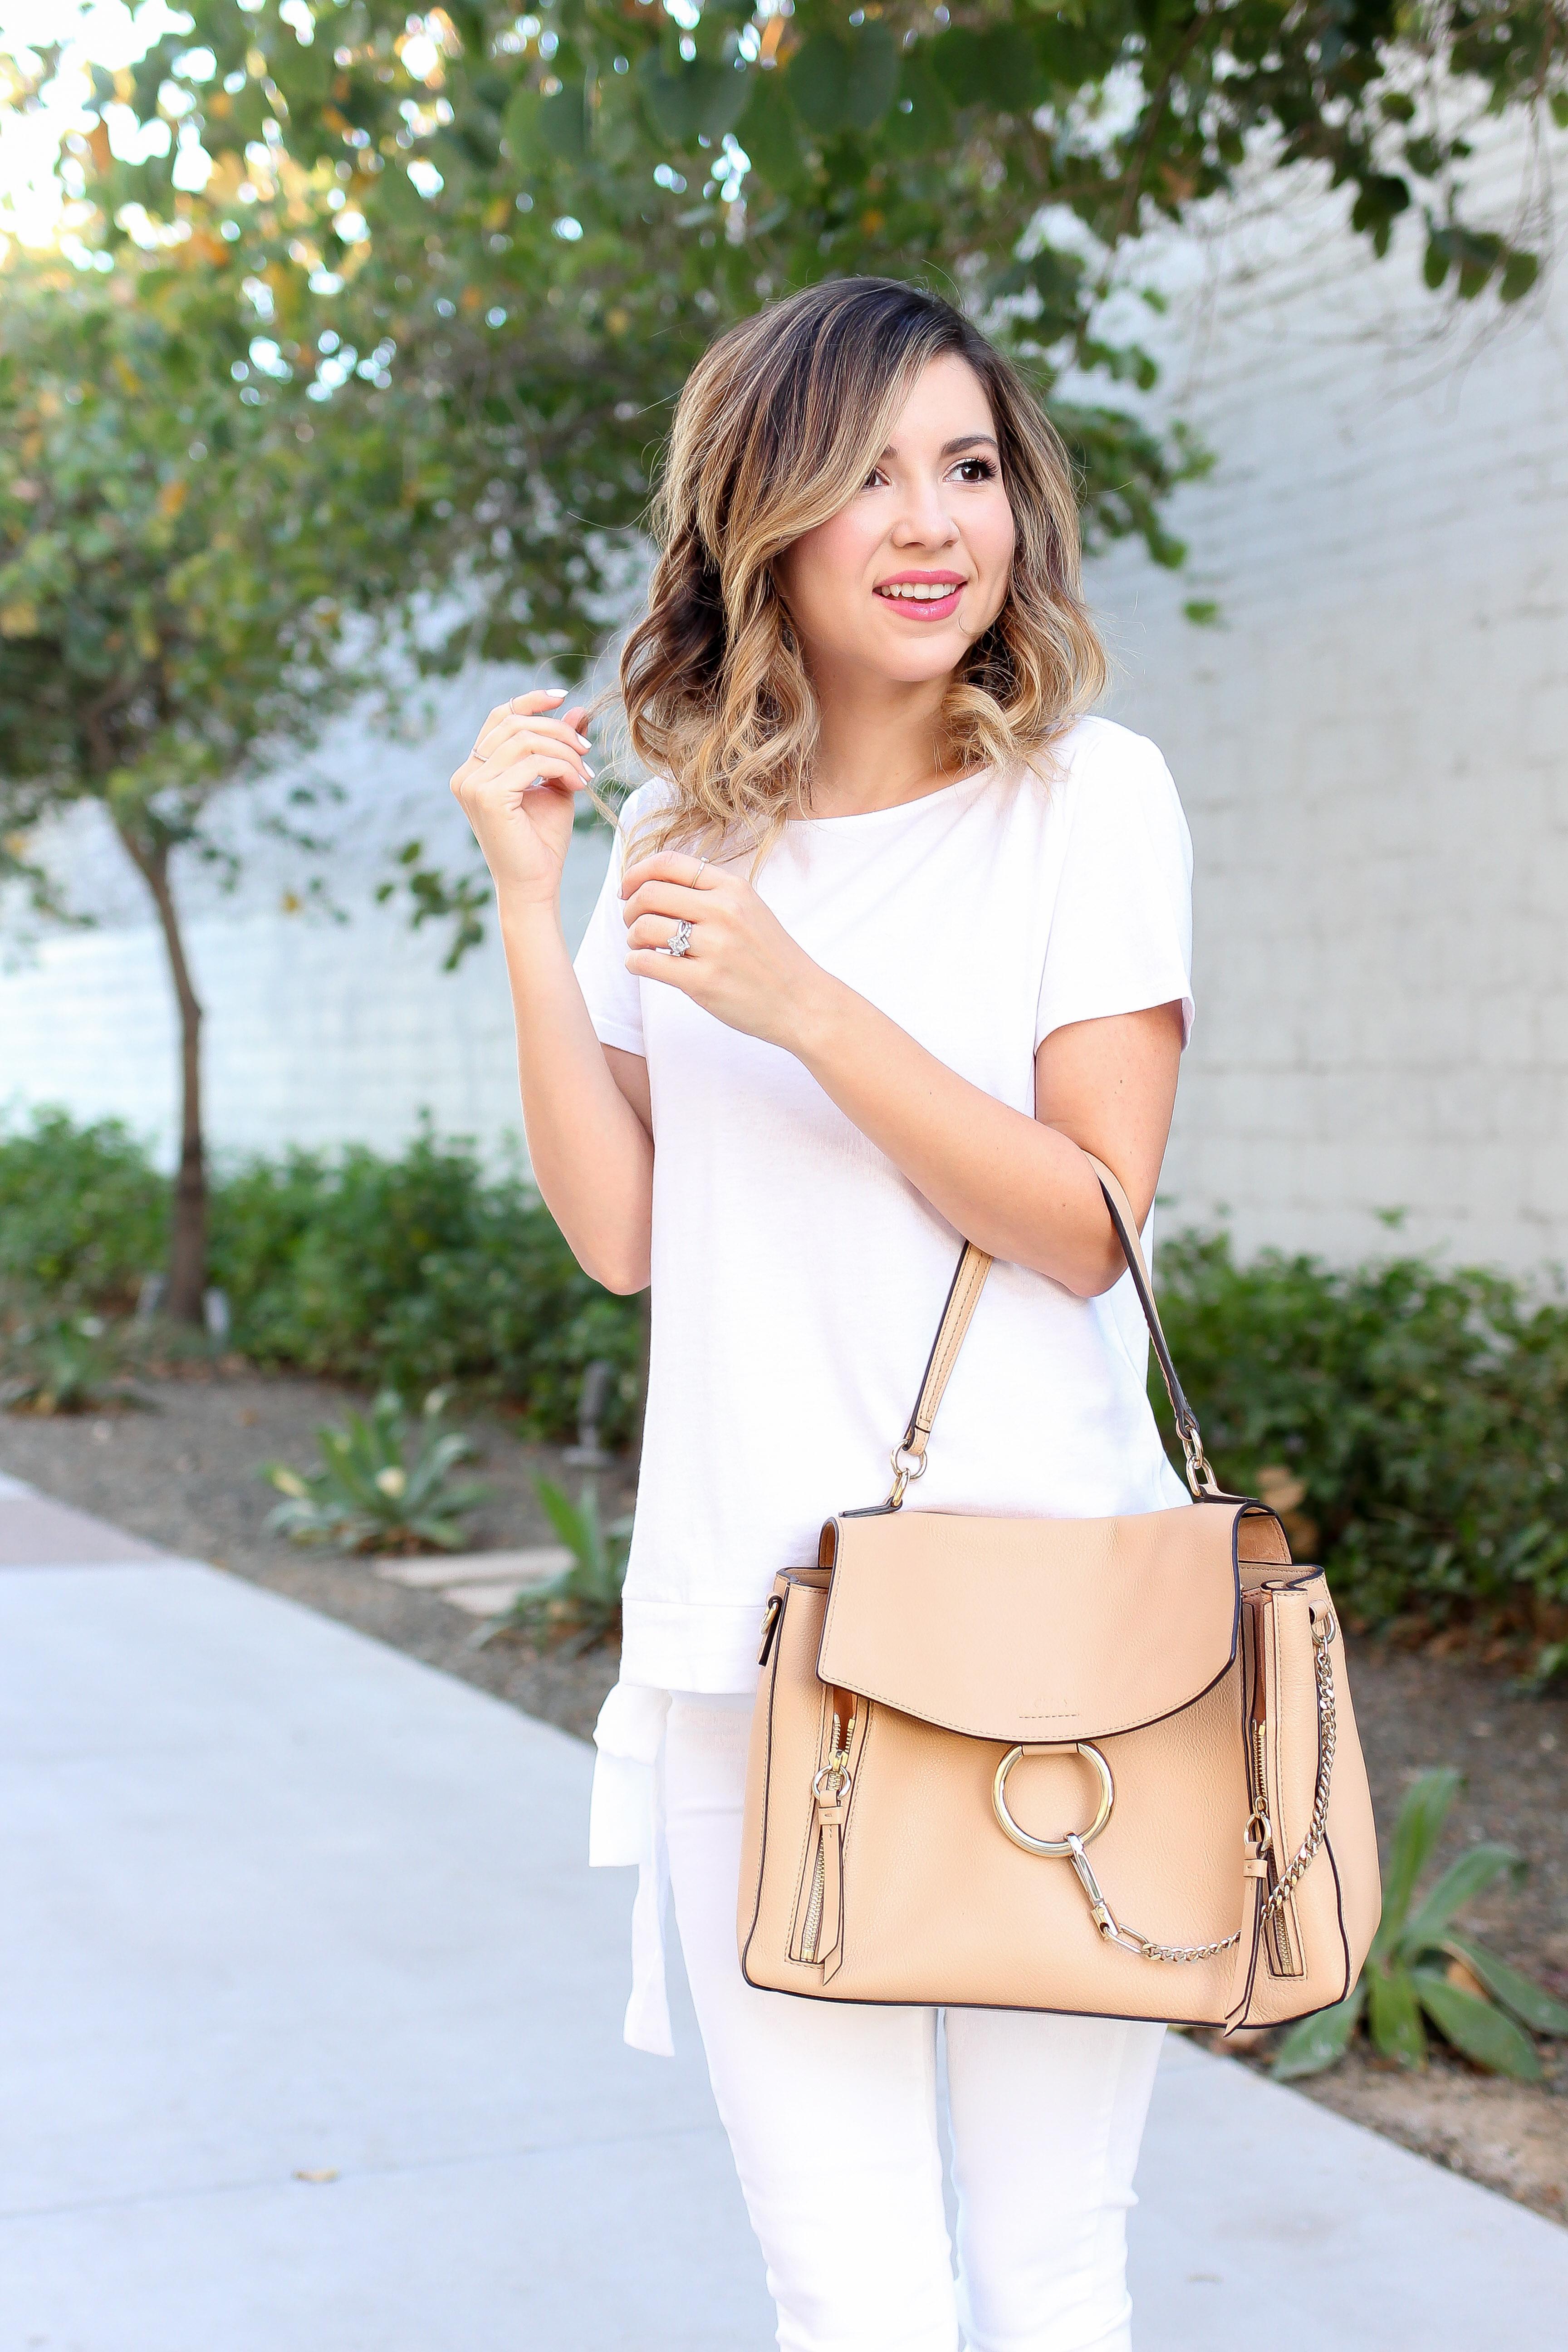 Simply Sutter - eBay - Authentic handbags - eBay fashion - chloe